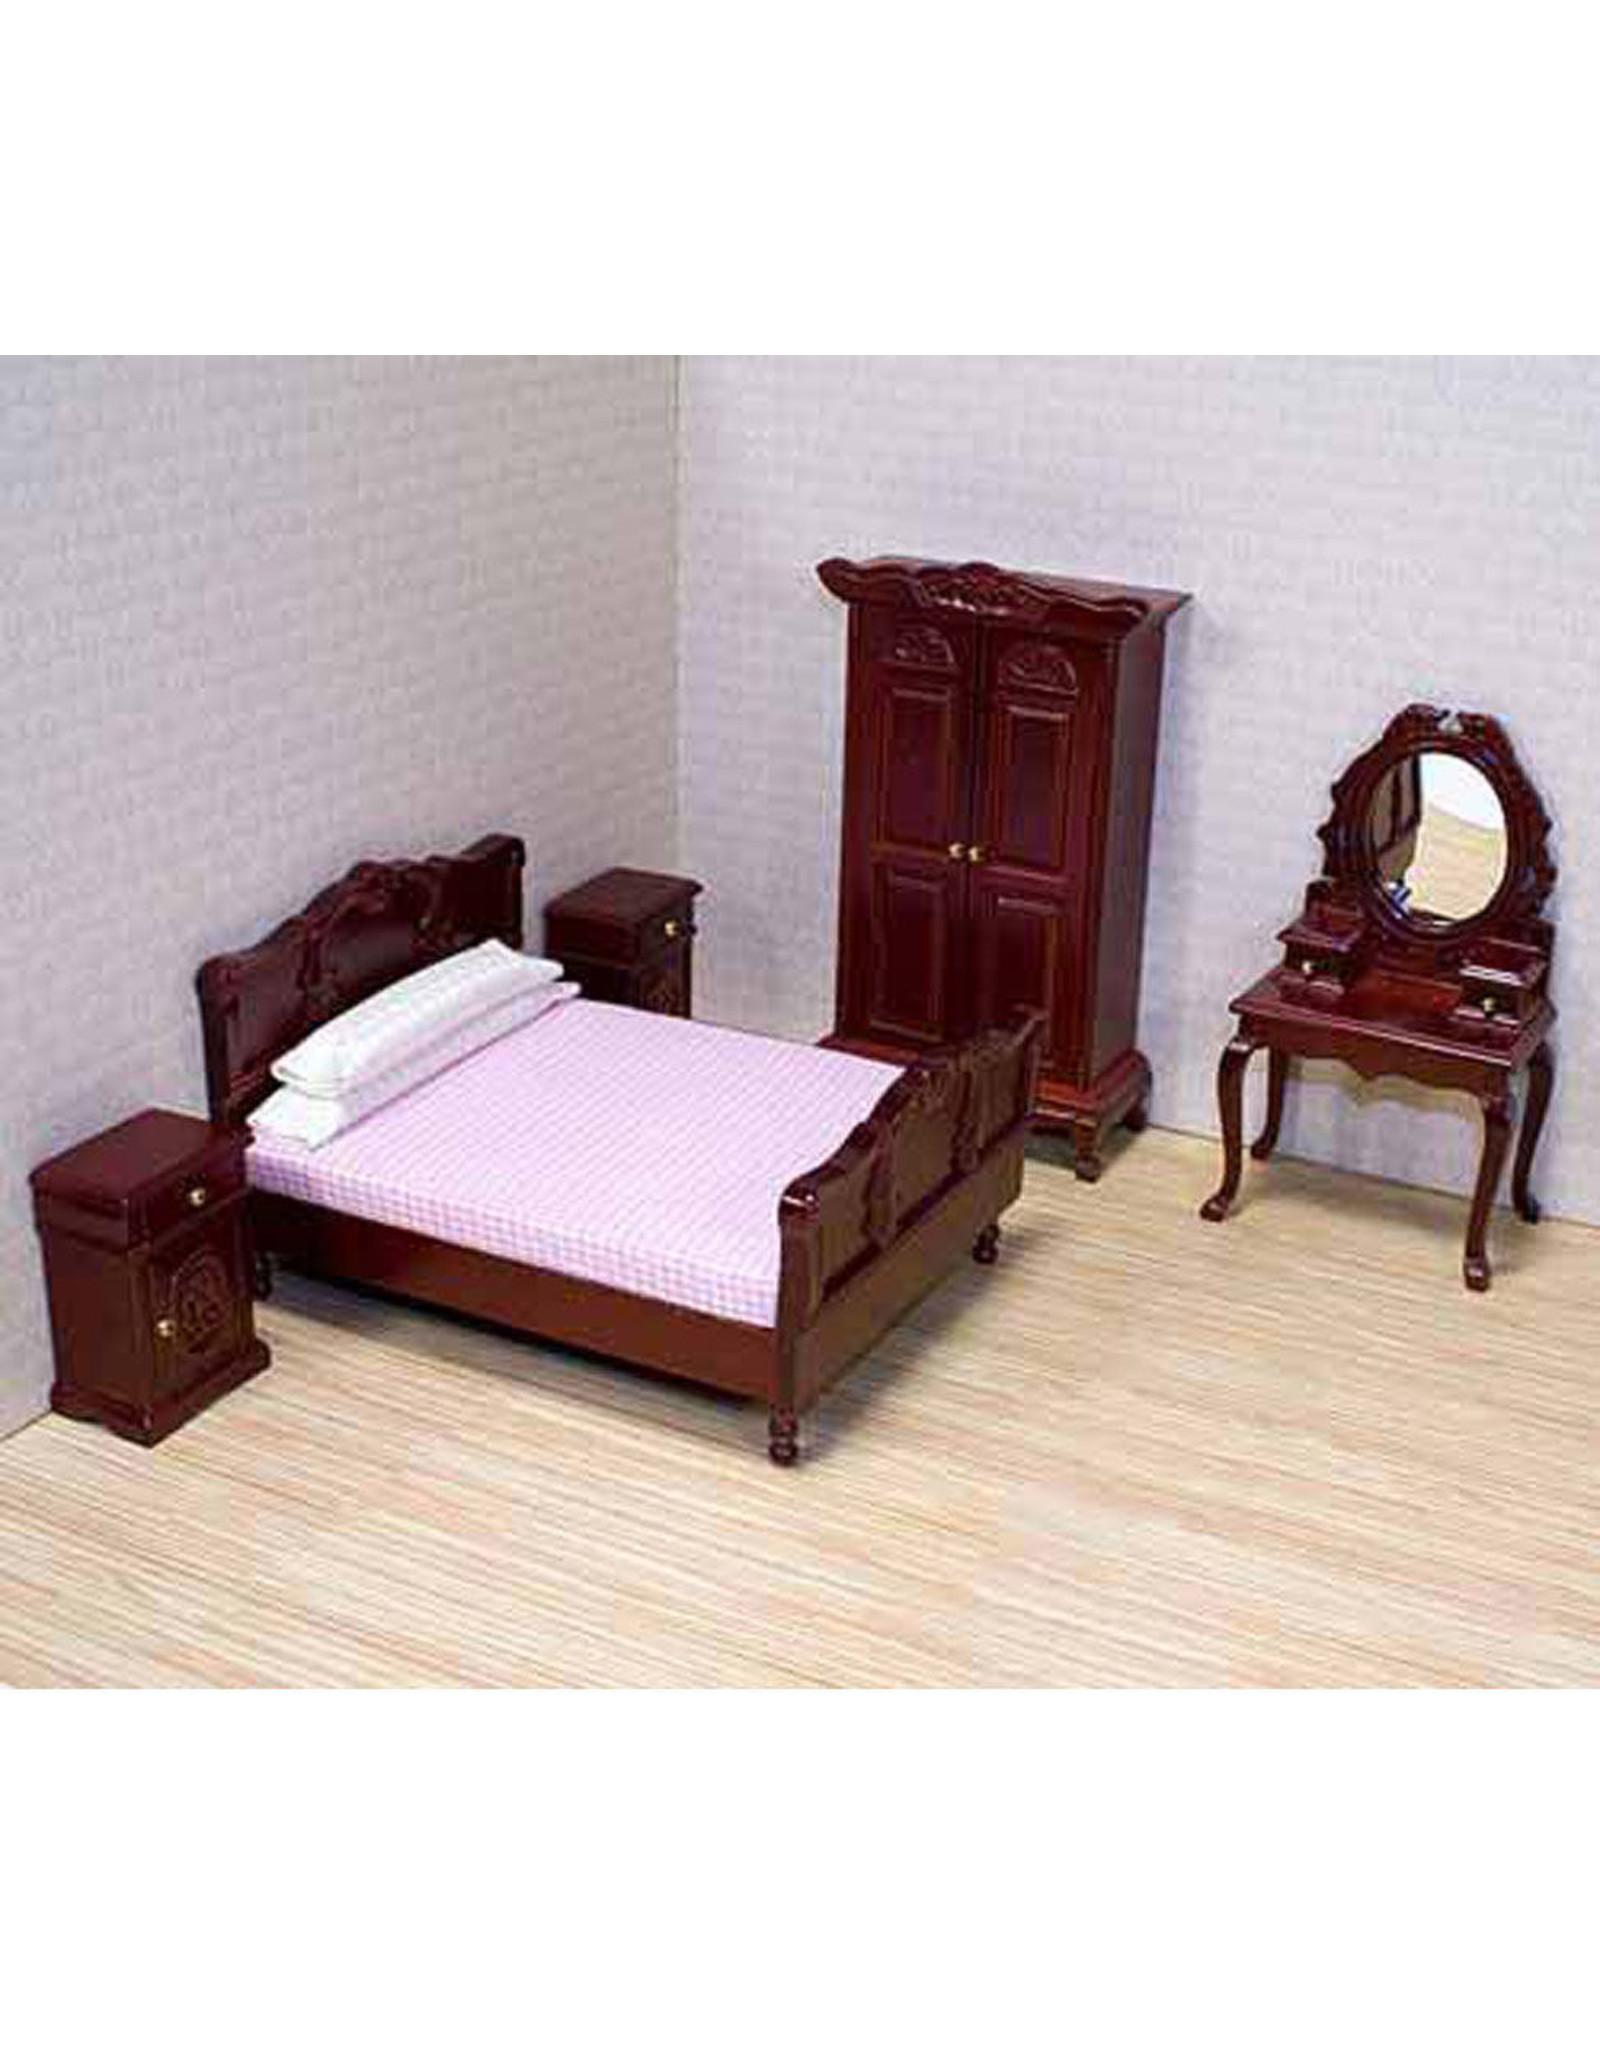 MELISSA & DOUG BEDROOM